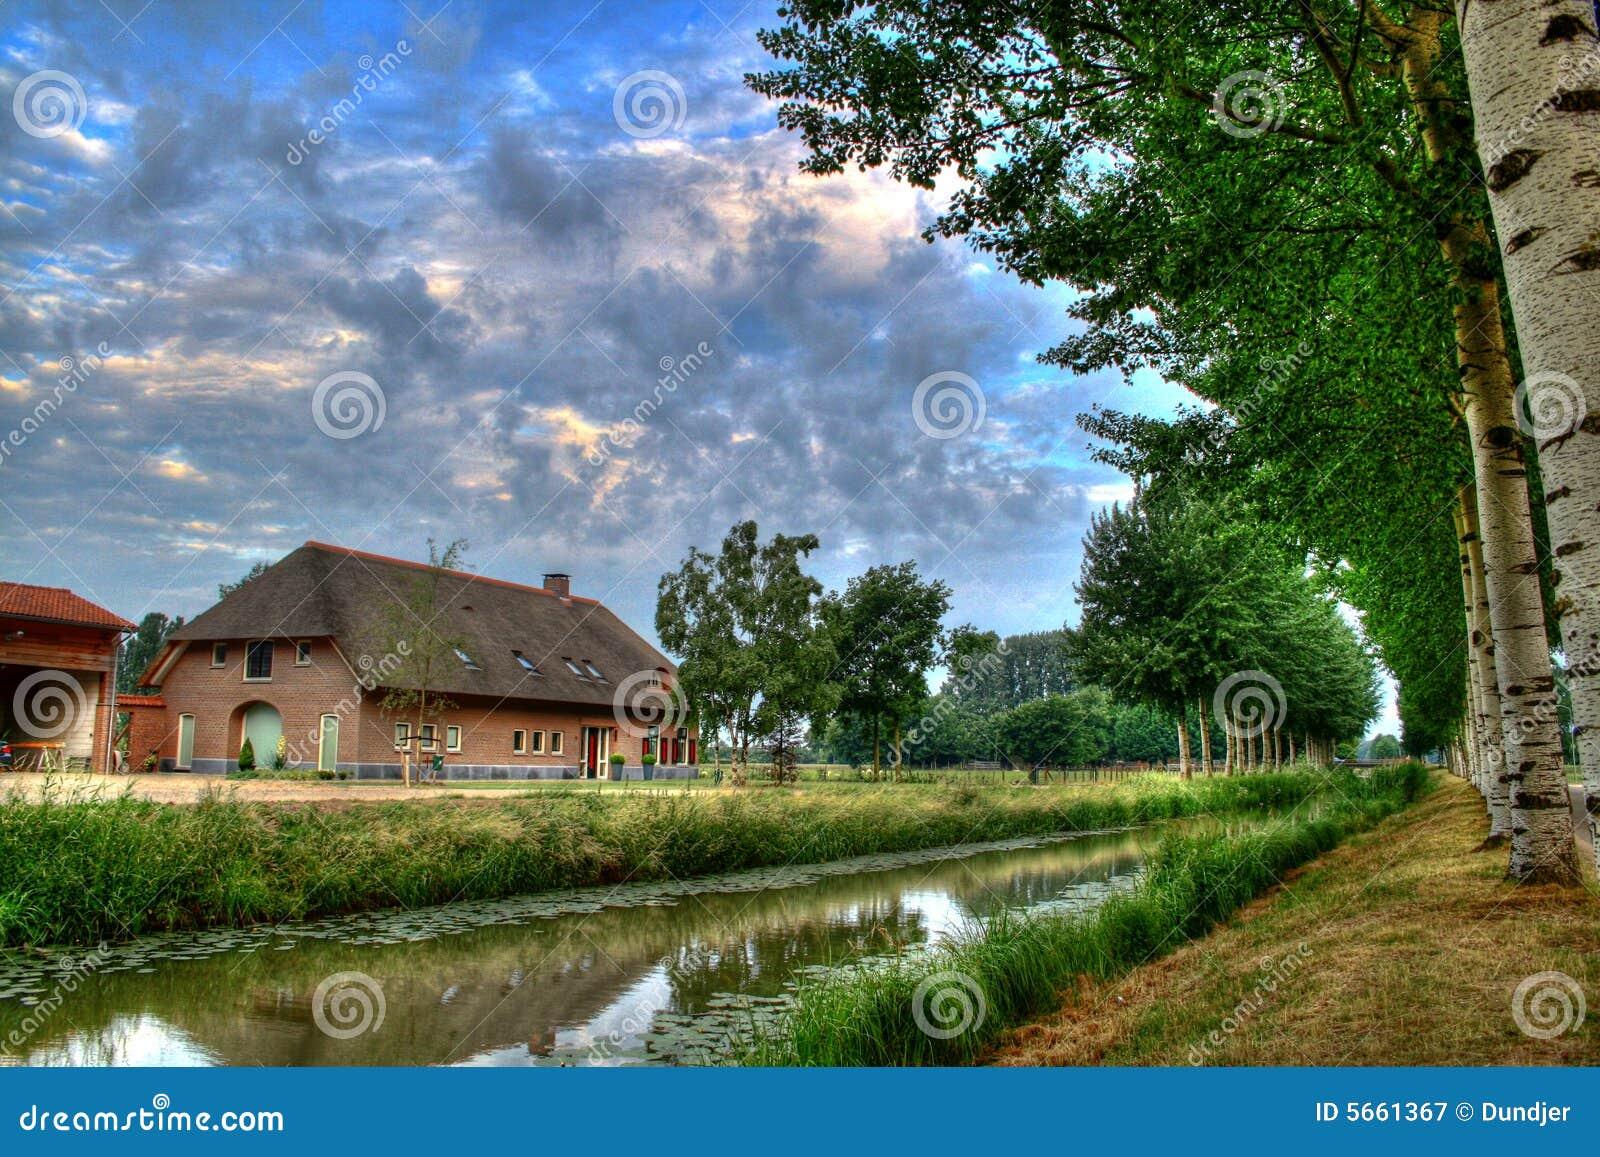 Dutch farm with dark blue ky royalty free stock for Farm house netherlands